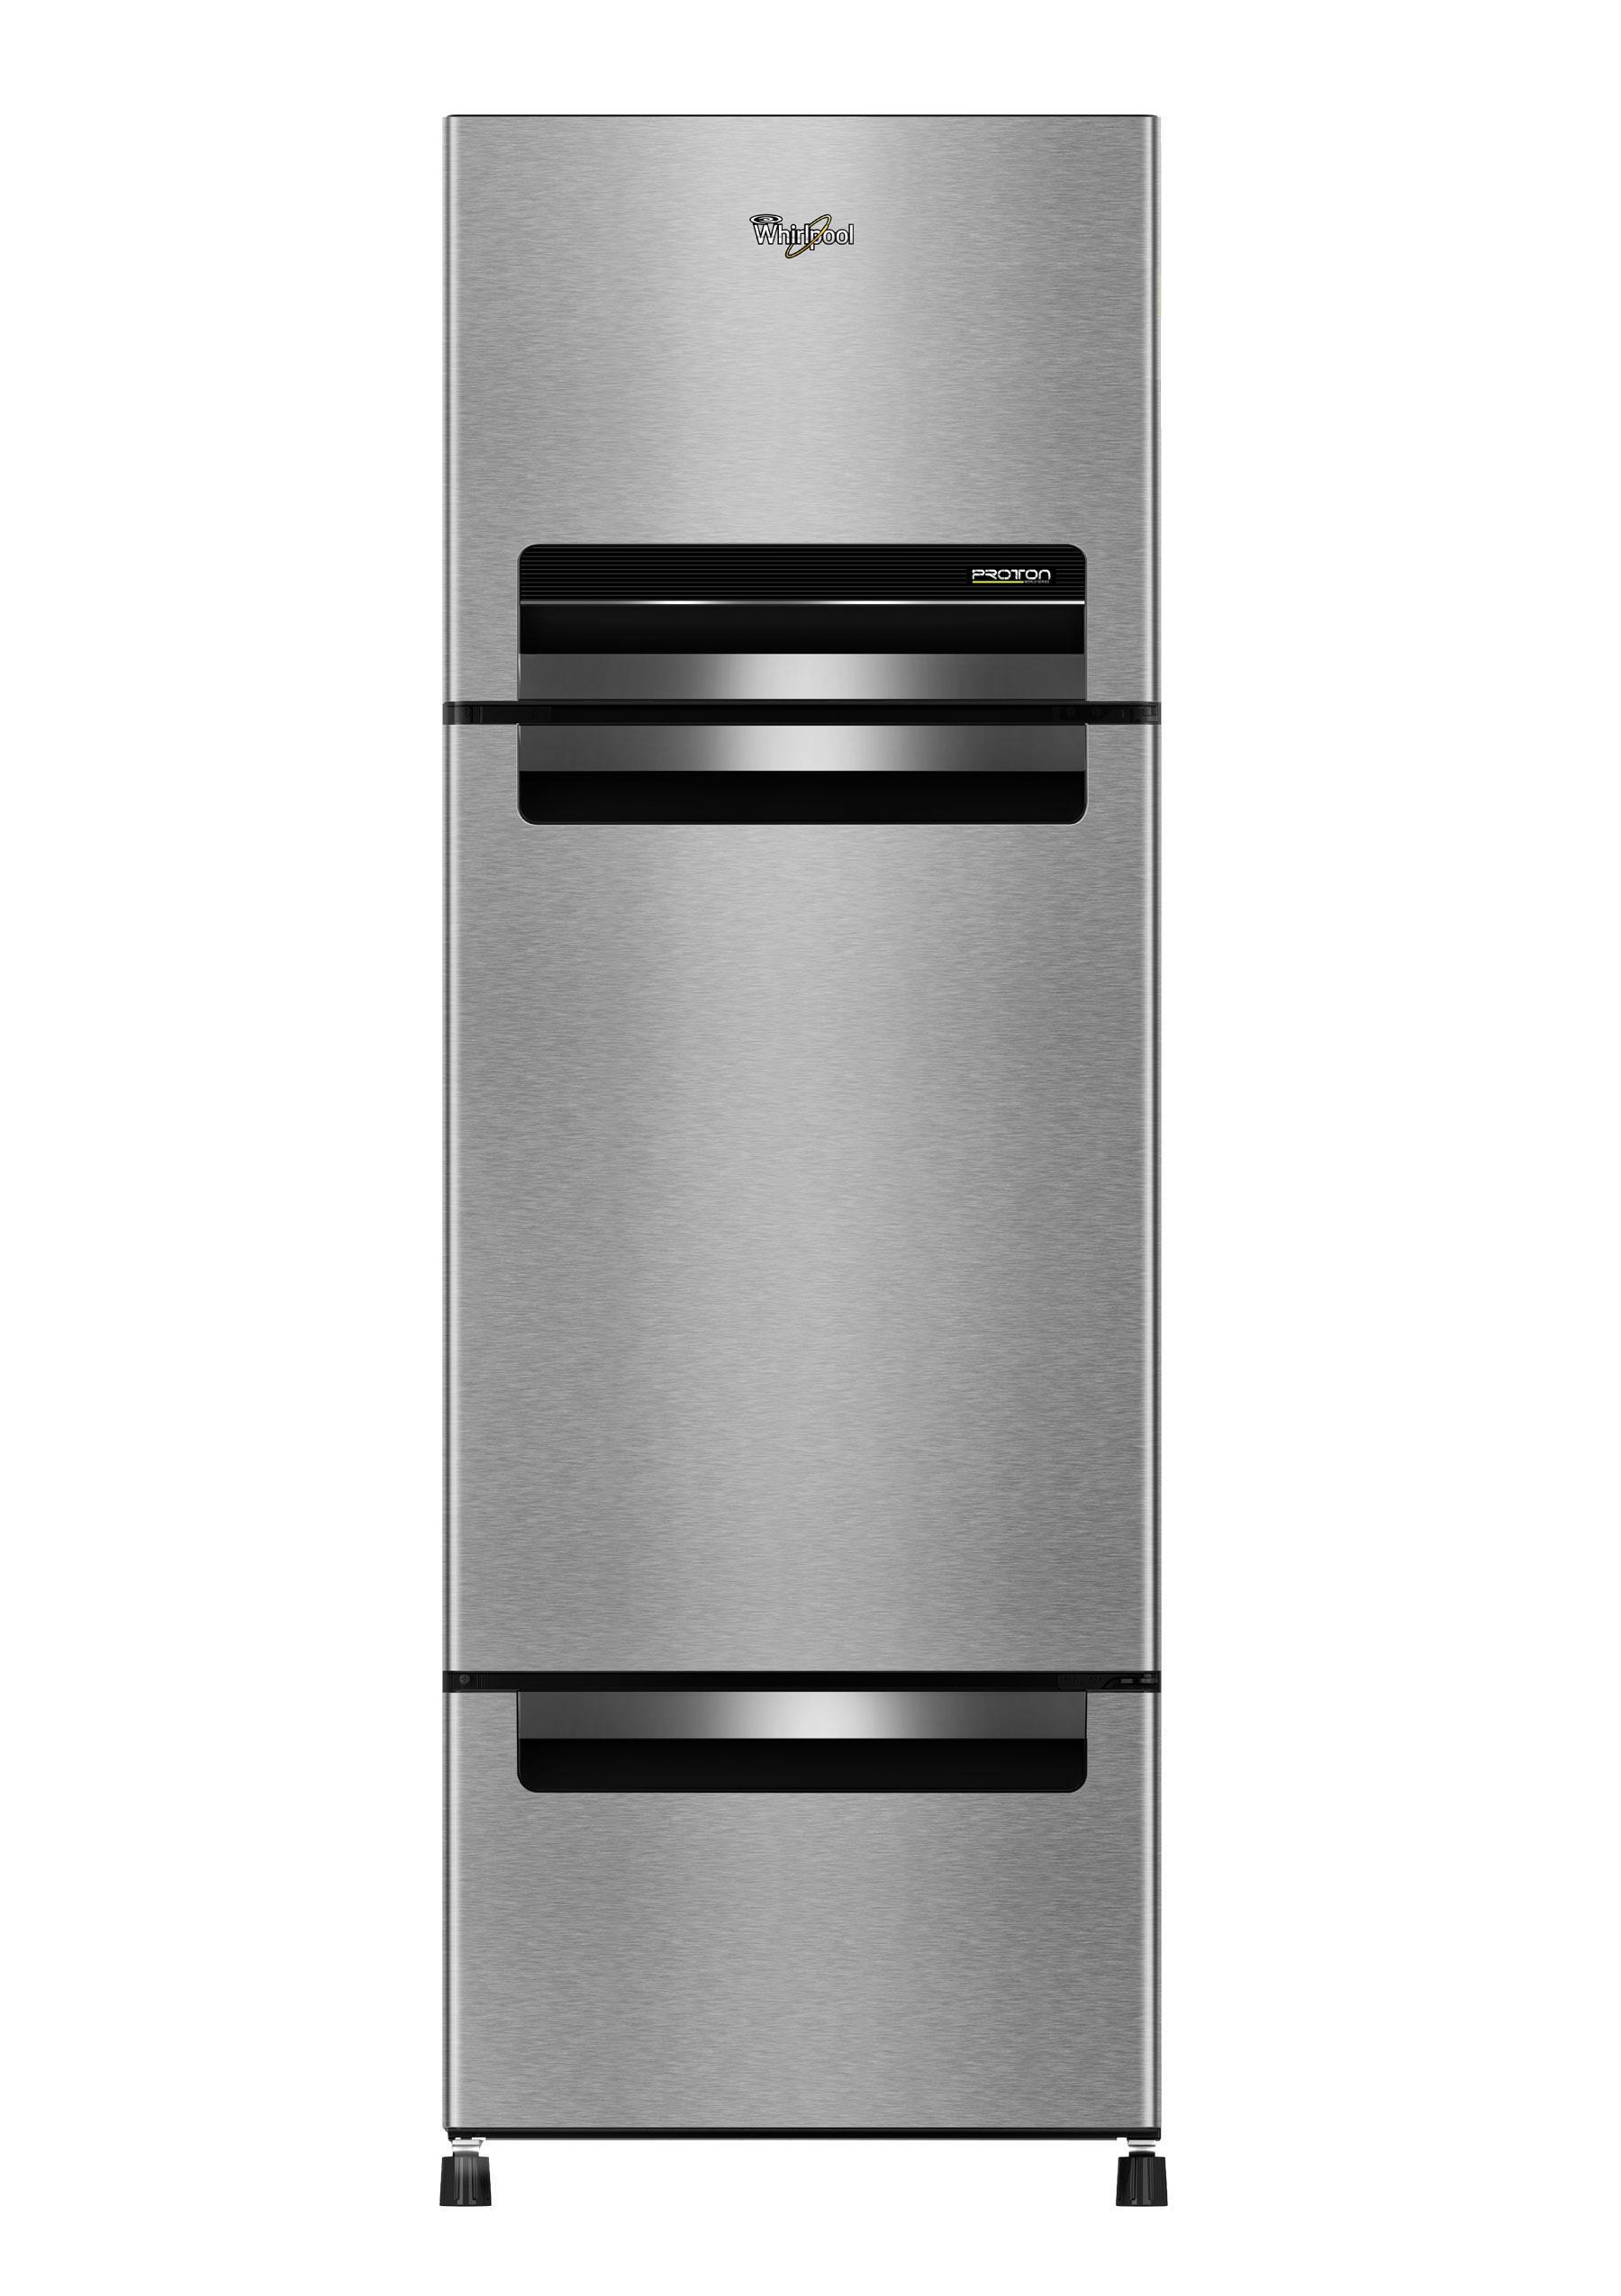 Whirlpool Three Door Refrigerator Fp 343d Protton Royal